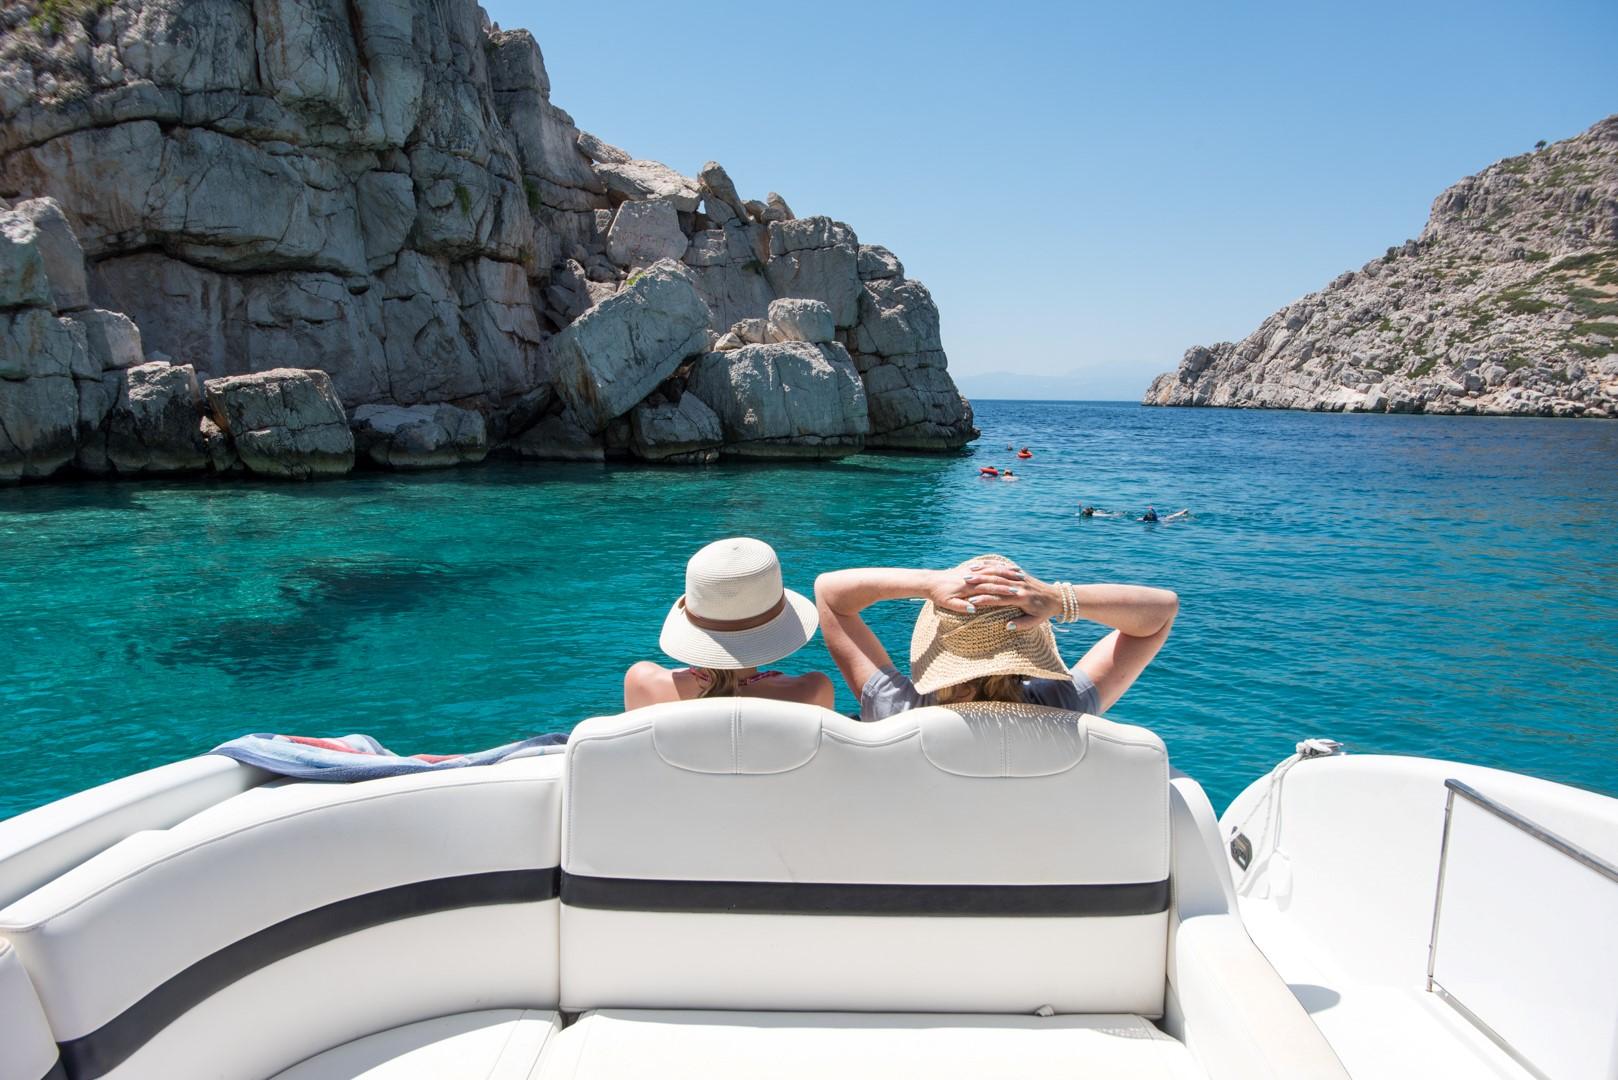 Private boat trips around Corinthian Gulf